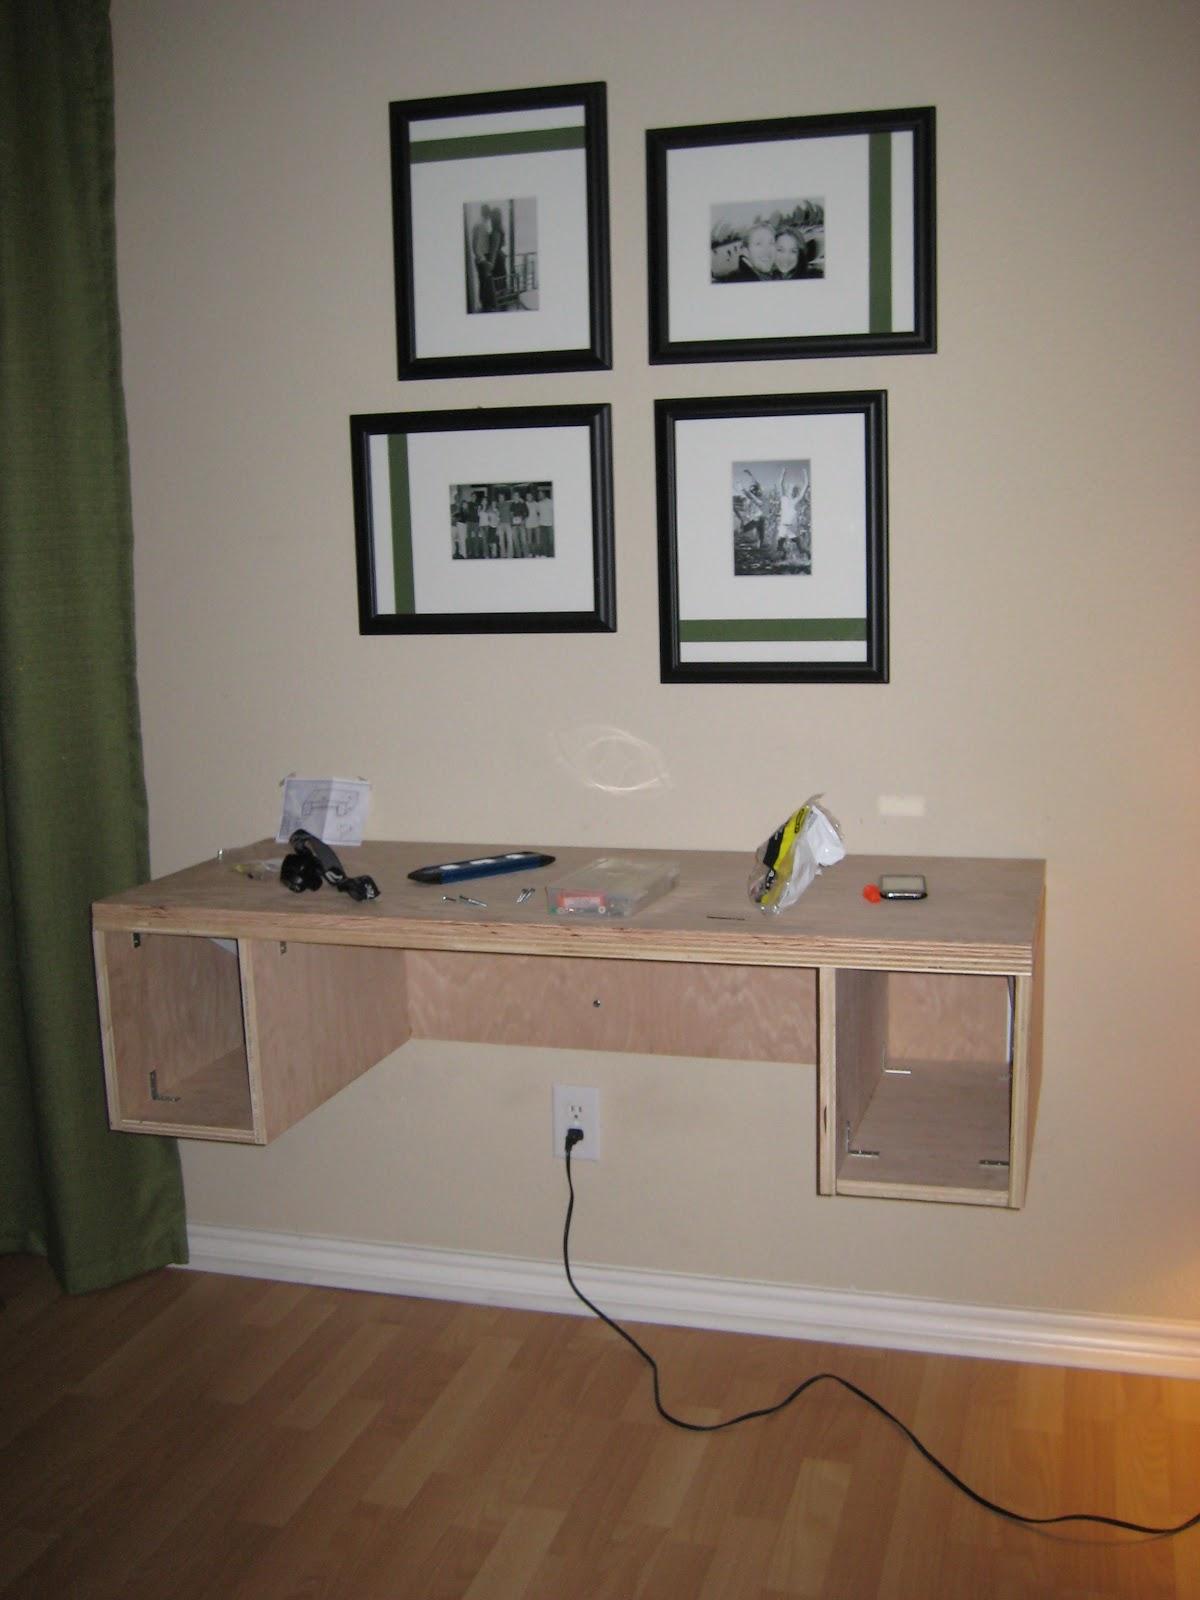 blinds inspiration of uncategorized pics popular handmade desk and fascinating homemade ideas